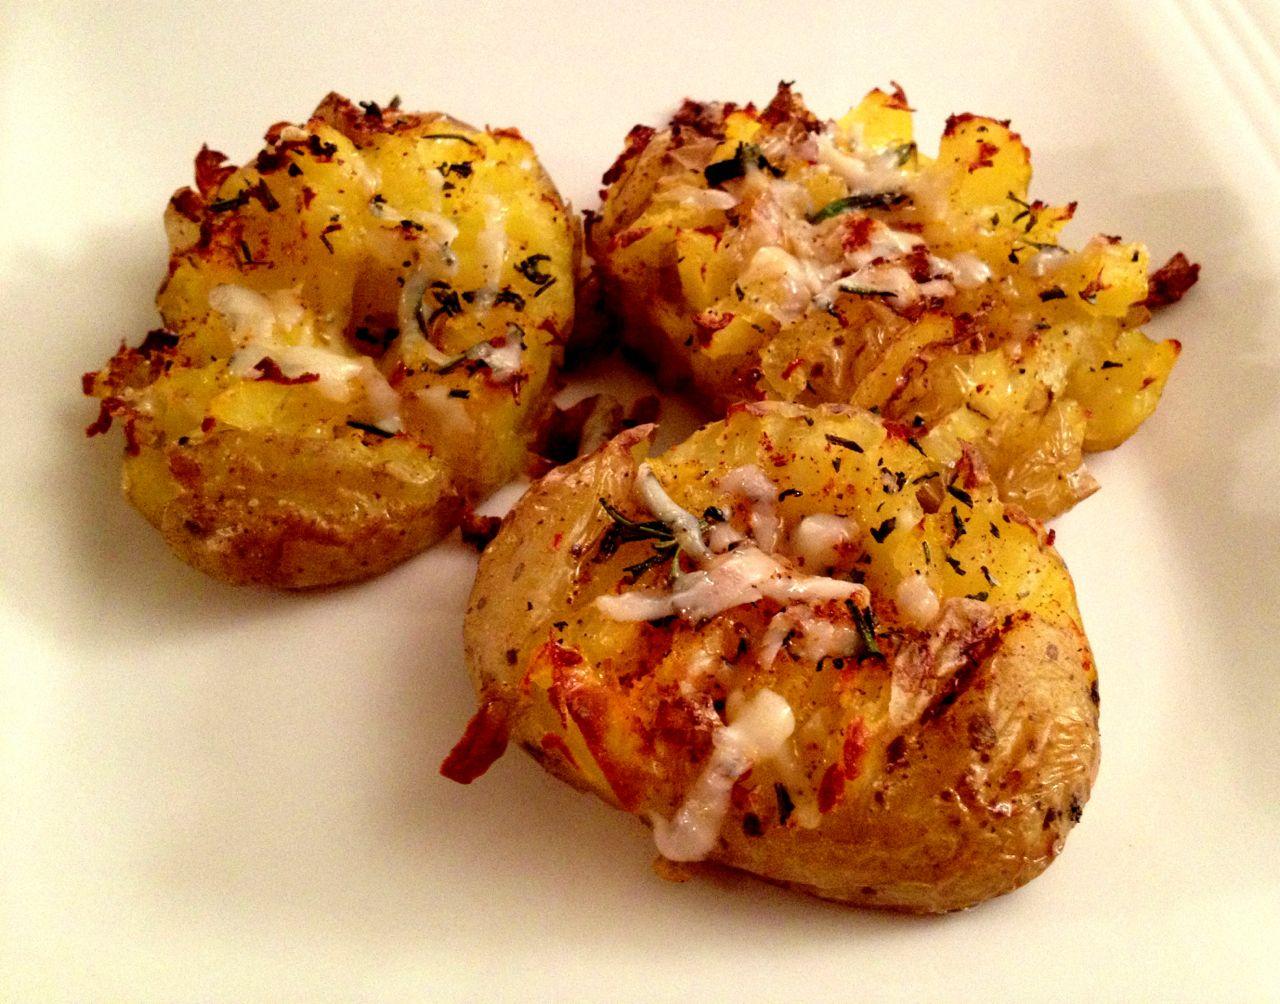 Smashed roasted potatoes with rosemary